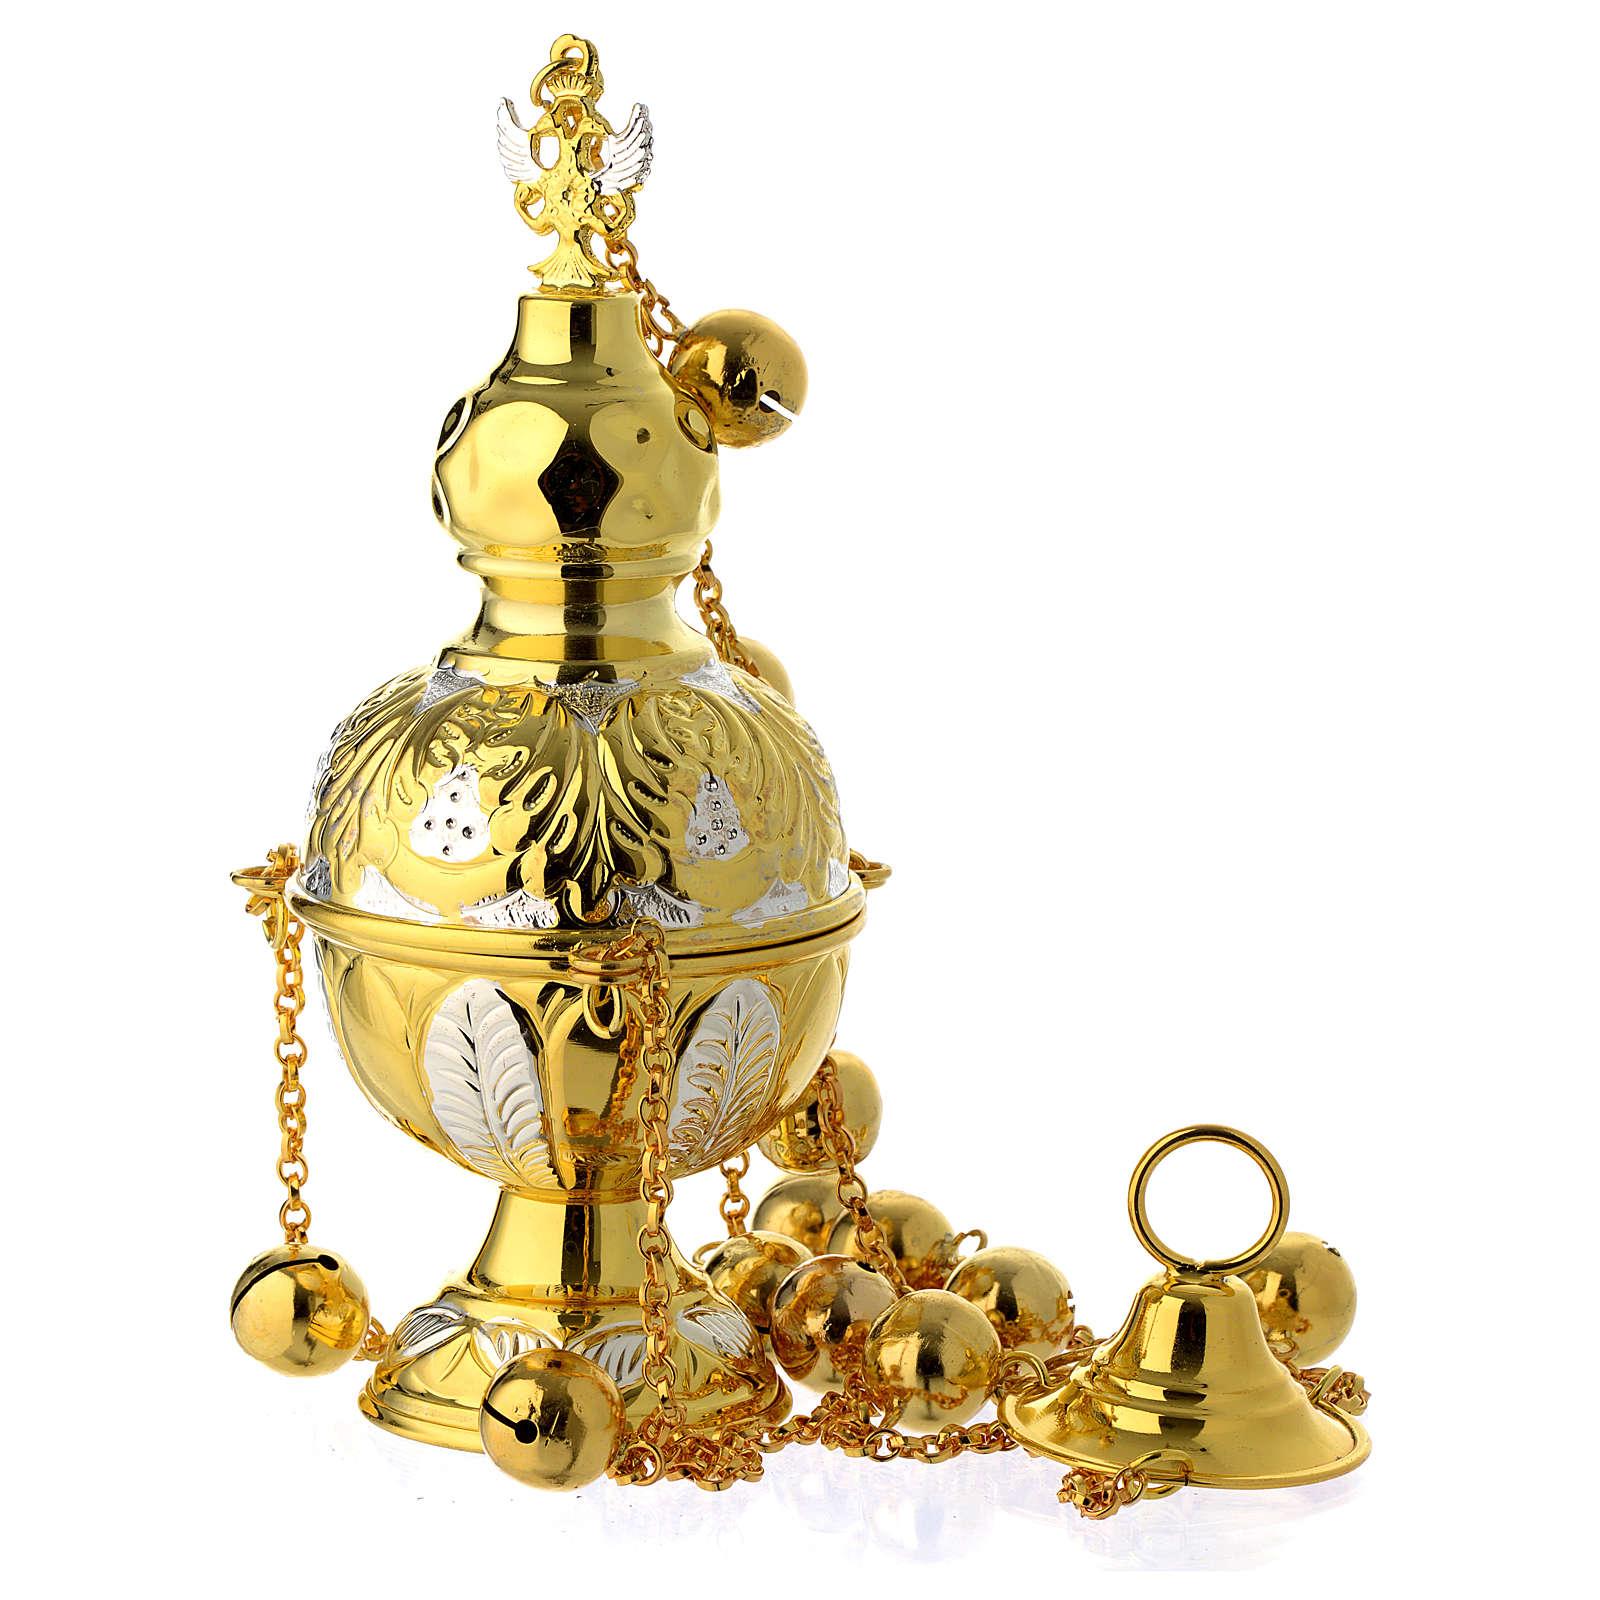 Turibolo stile ortodosso oro argento 3